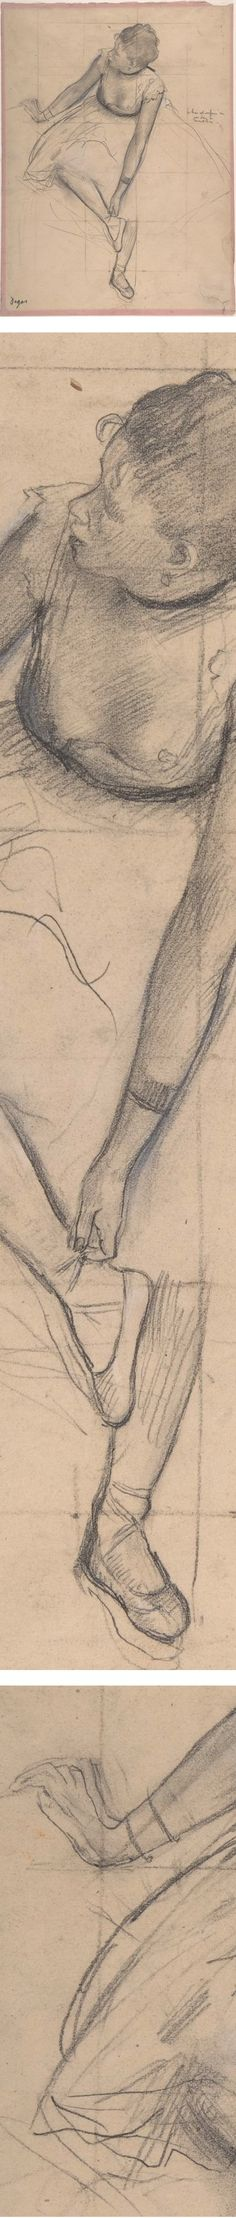 Dancer Adjusting her Slipper, Edgar Degas, pencil drawing- artists using grid method transfer